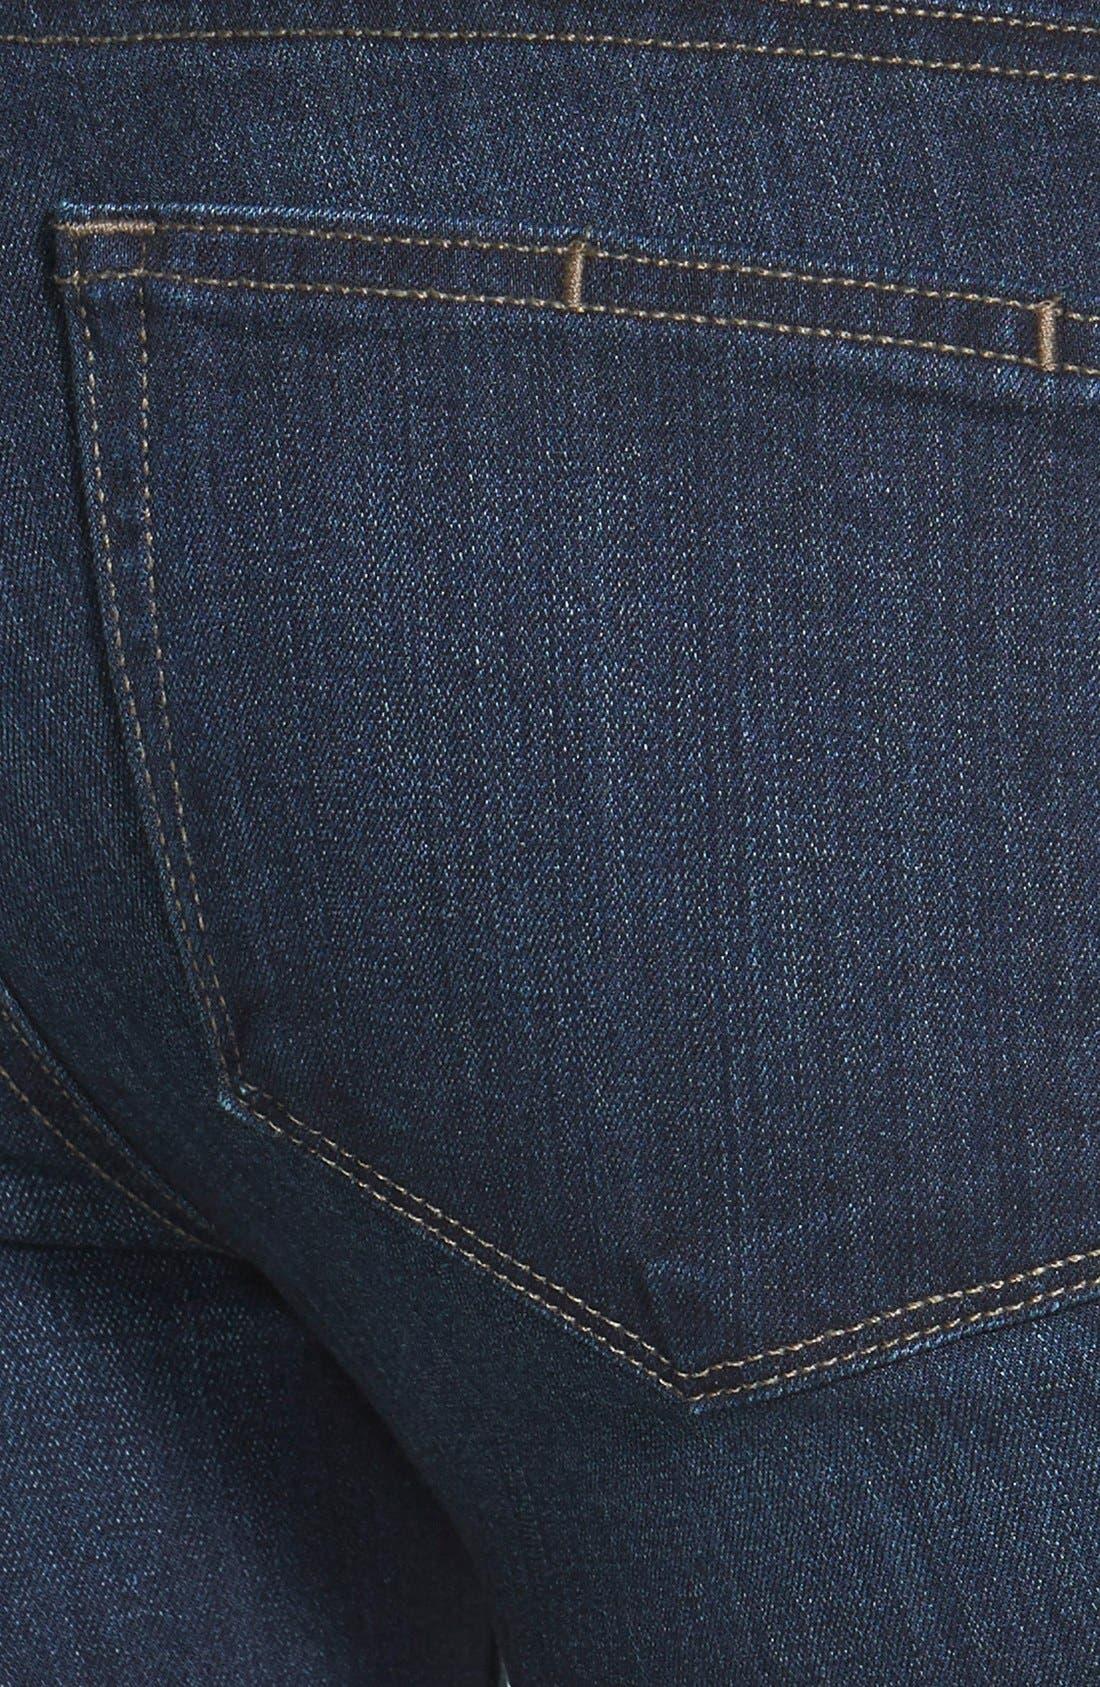 Alternate Image 3  - Paige Denim 'Skyline' Skinny Jeans (Cameron)